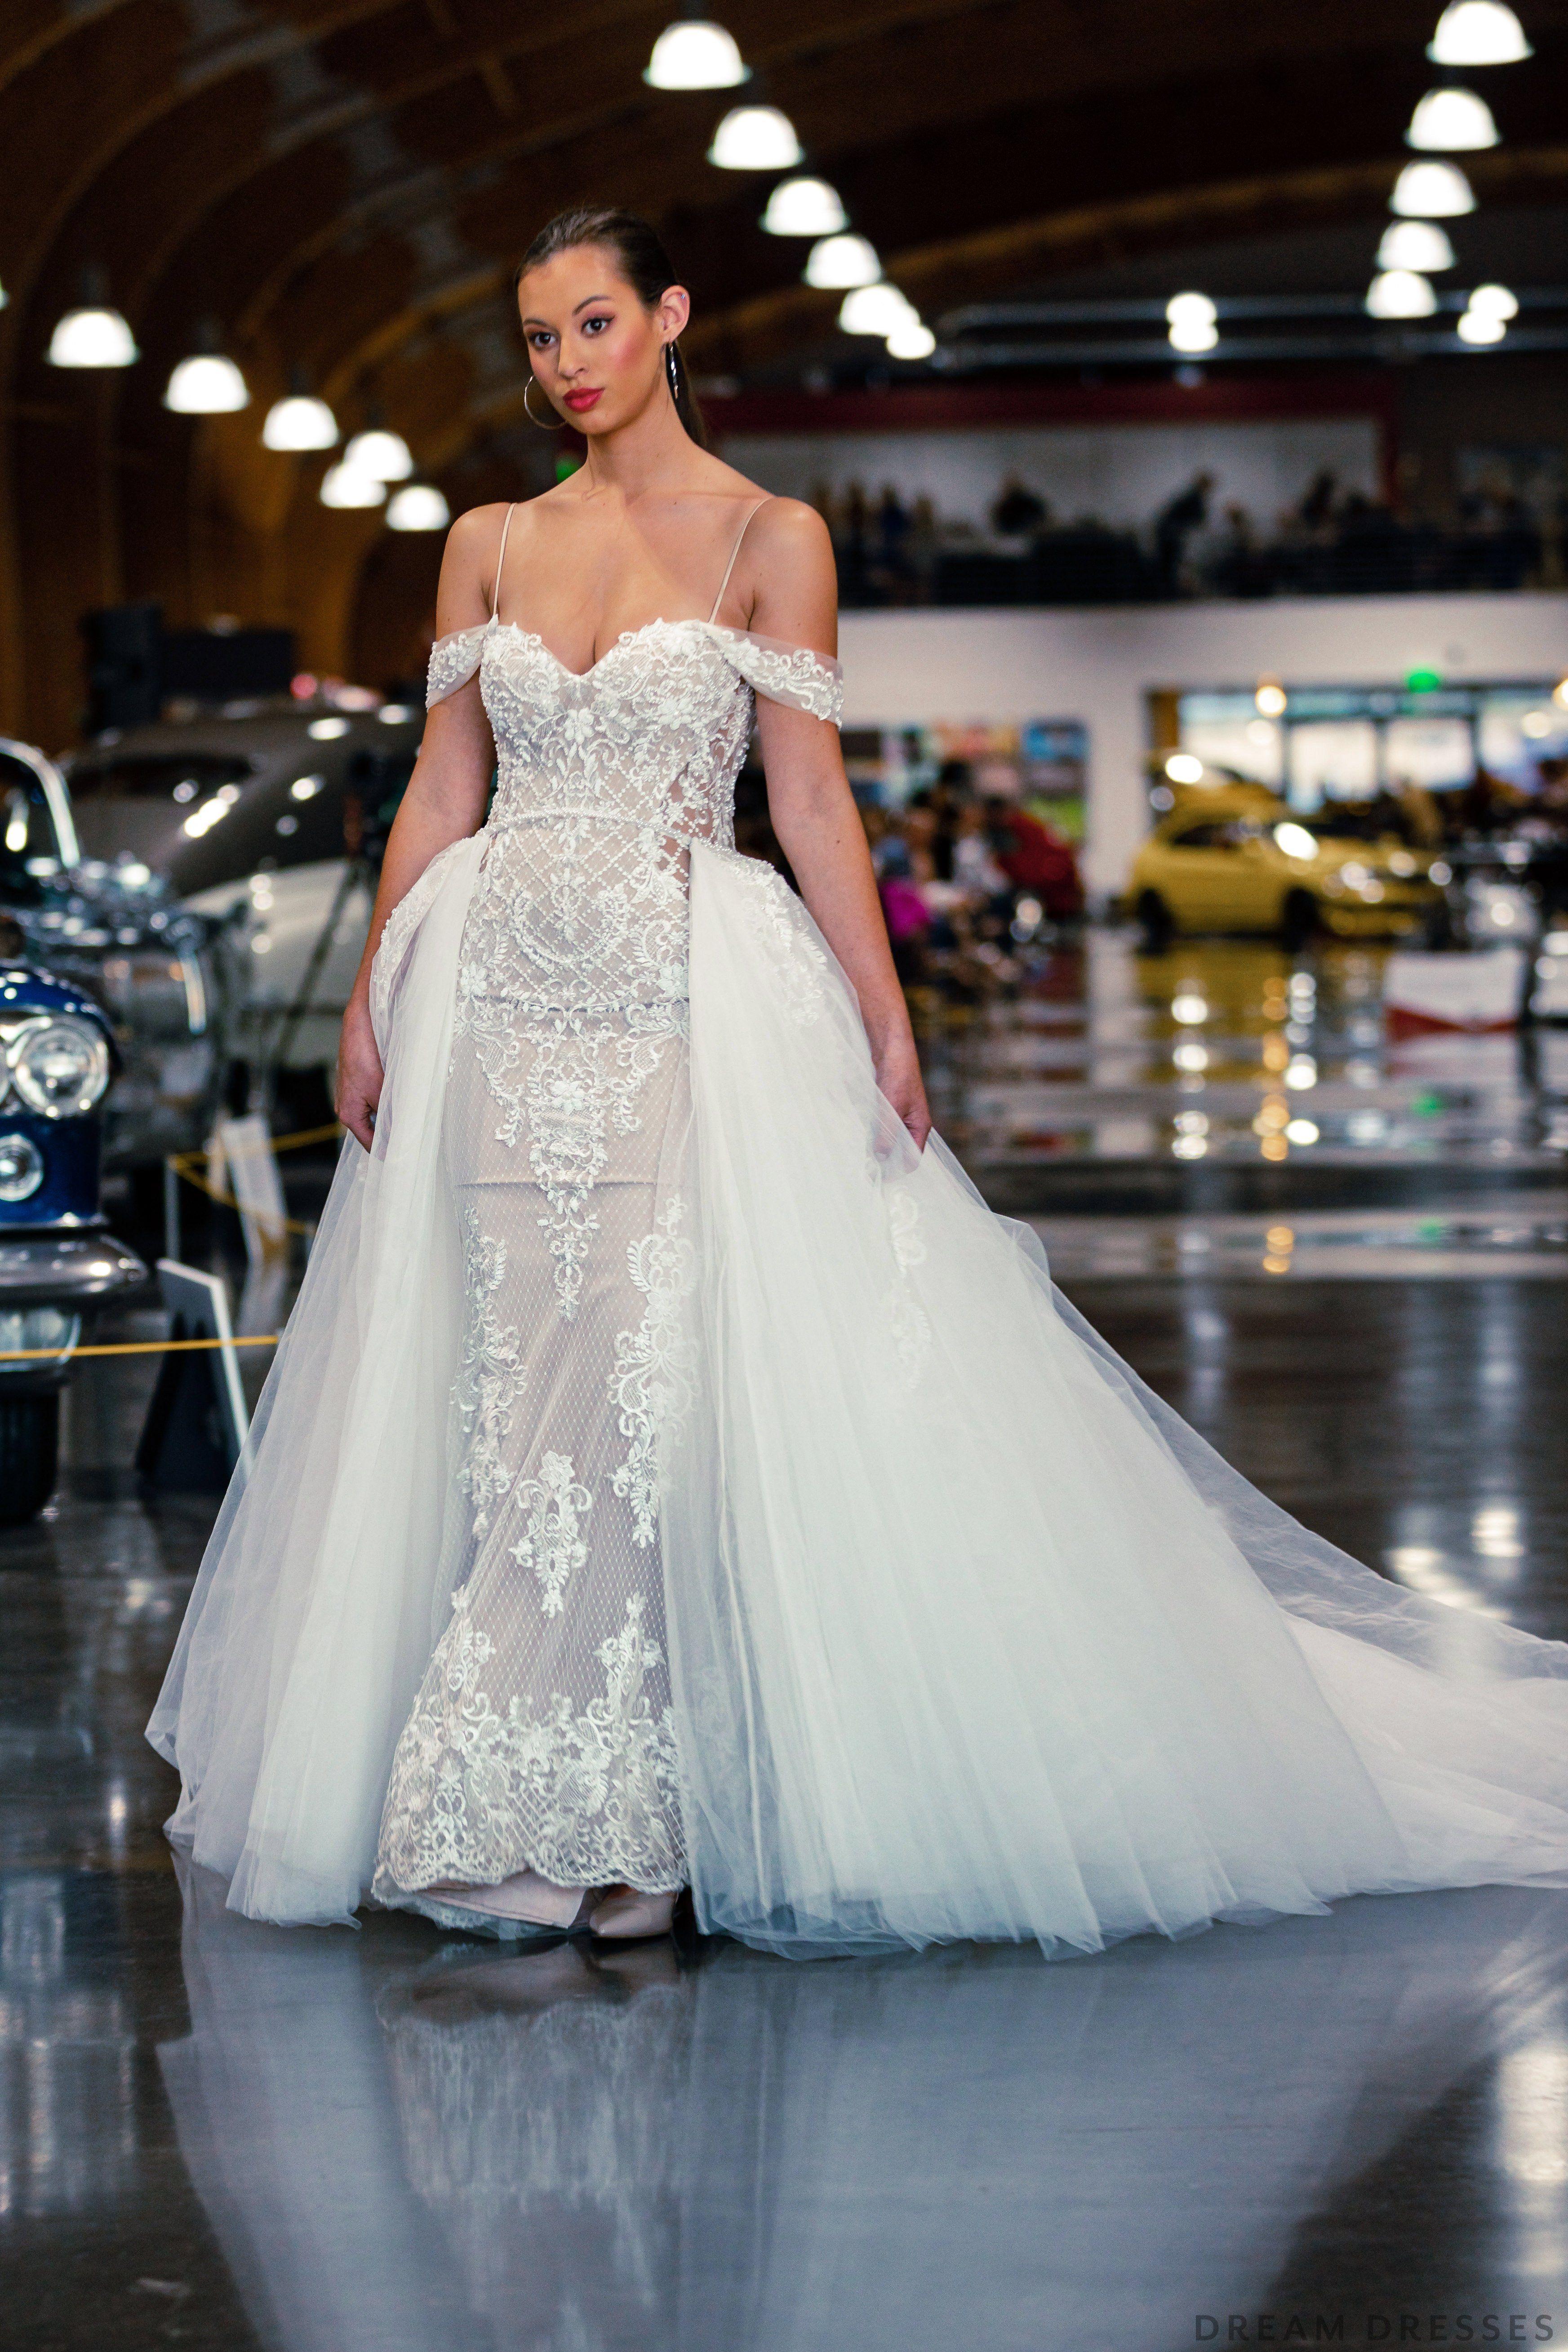 Blush Mermaid Wedding Dress With Removable Overskirt Belva Wedding Dresses Blush Wedding Dresses Unique Wedding Dresses [ 5234 x 3489 Pixel ]